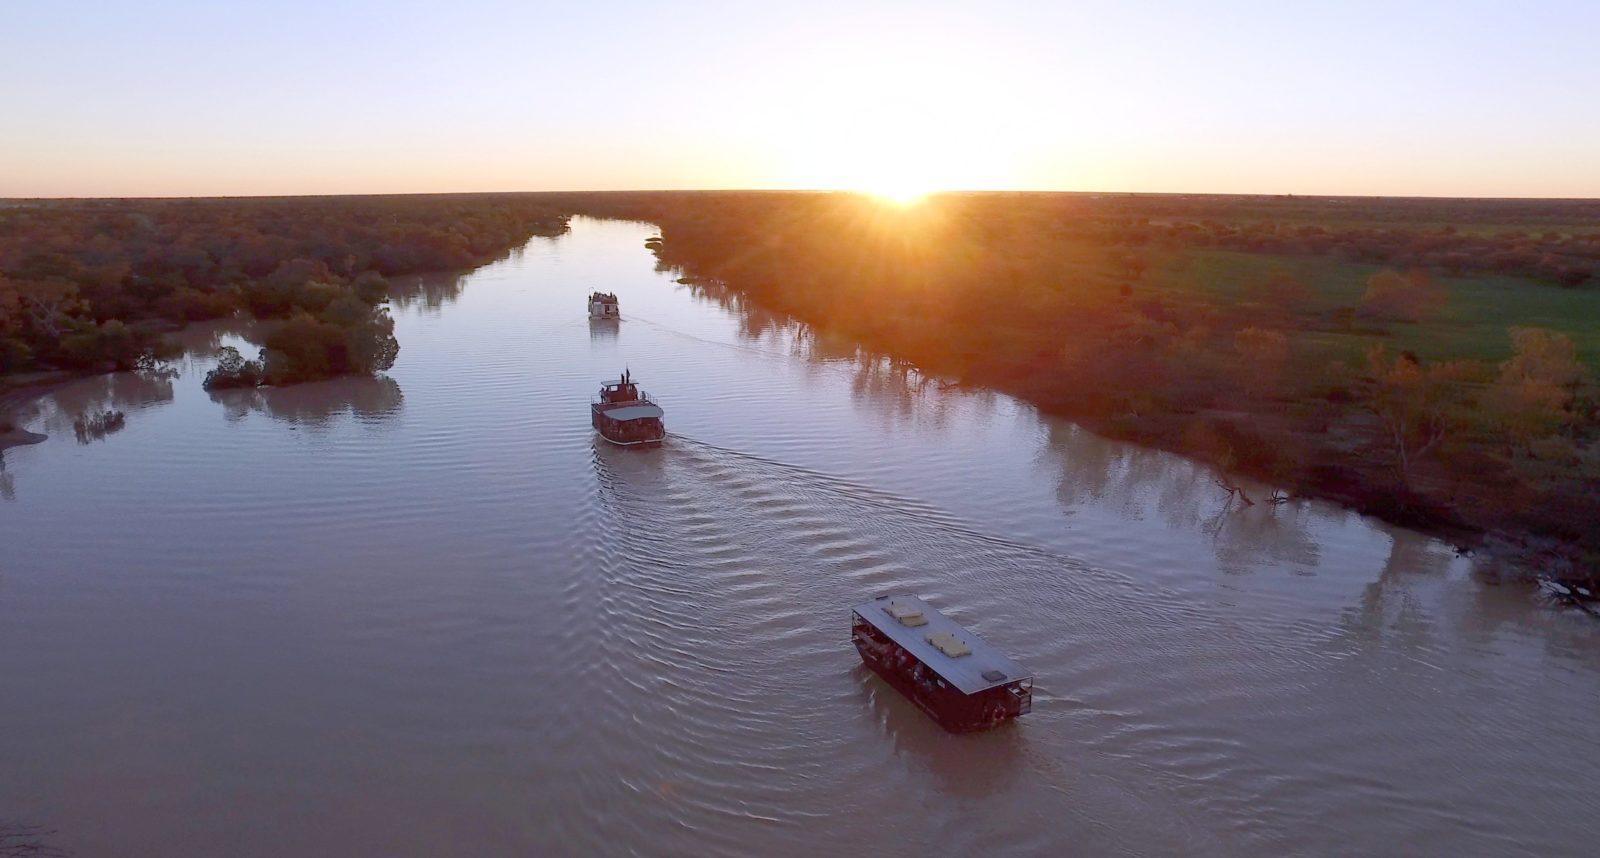 Thomson River Cruising